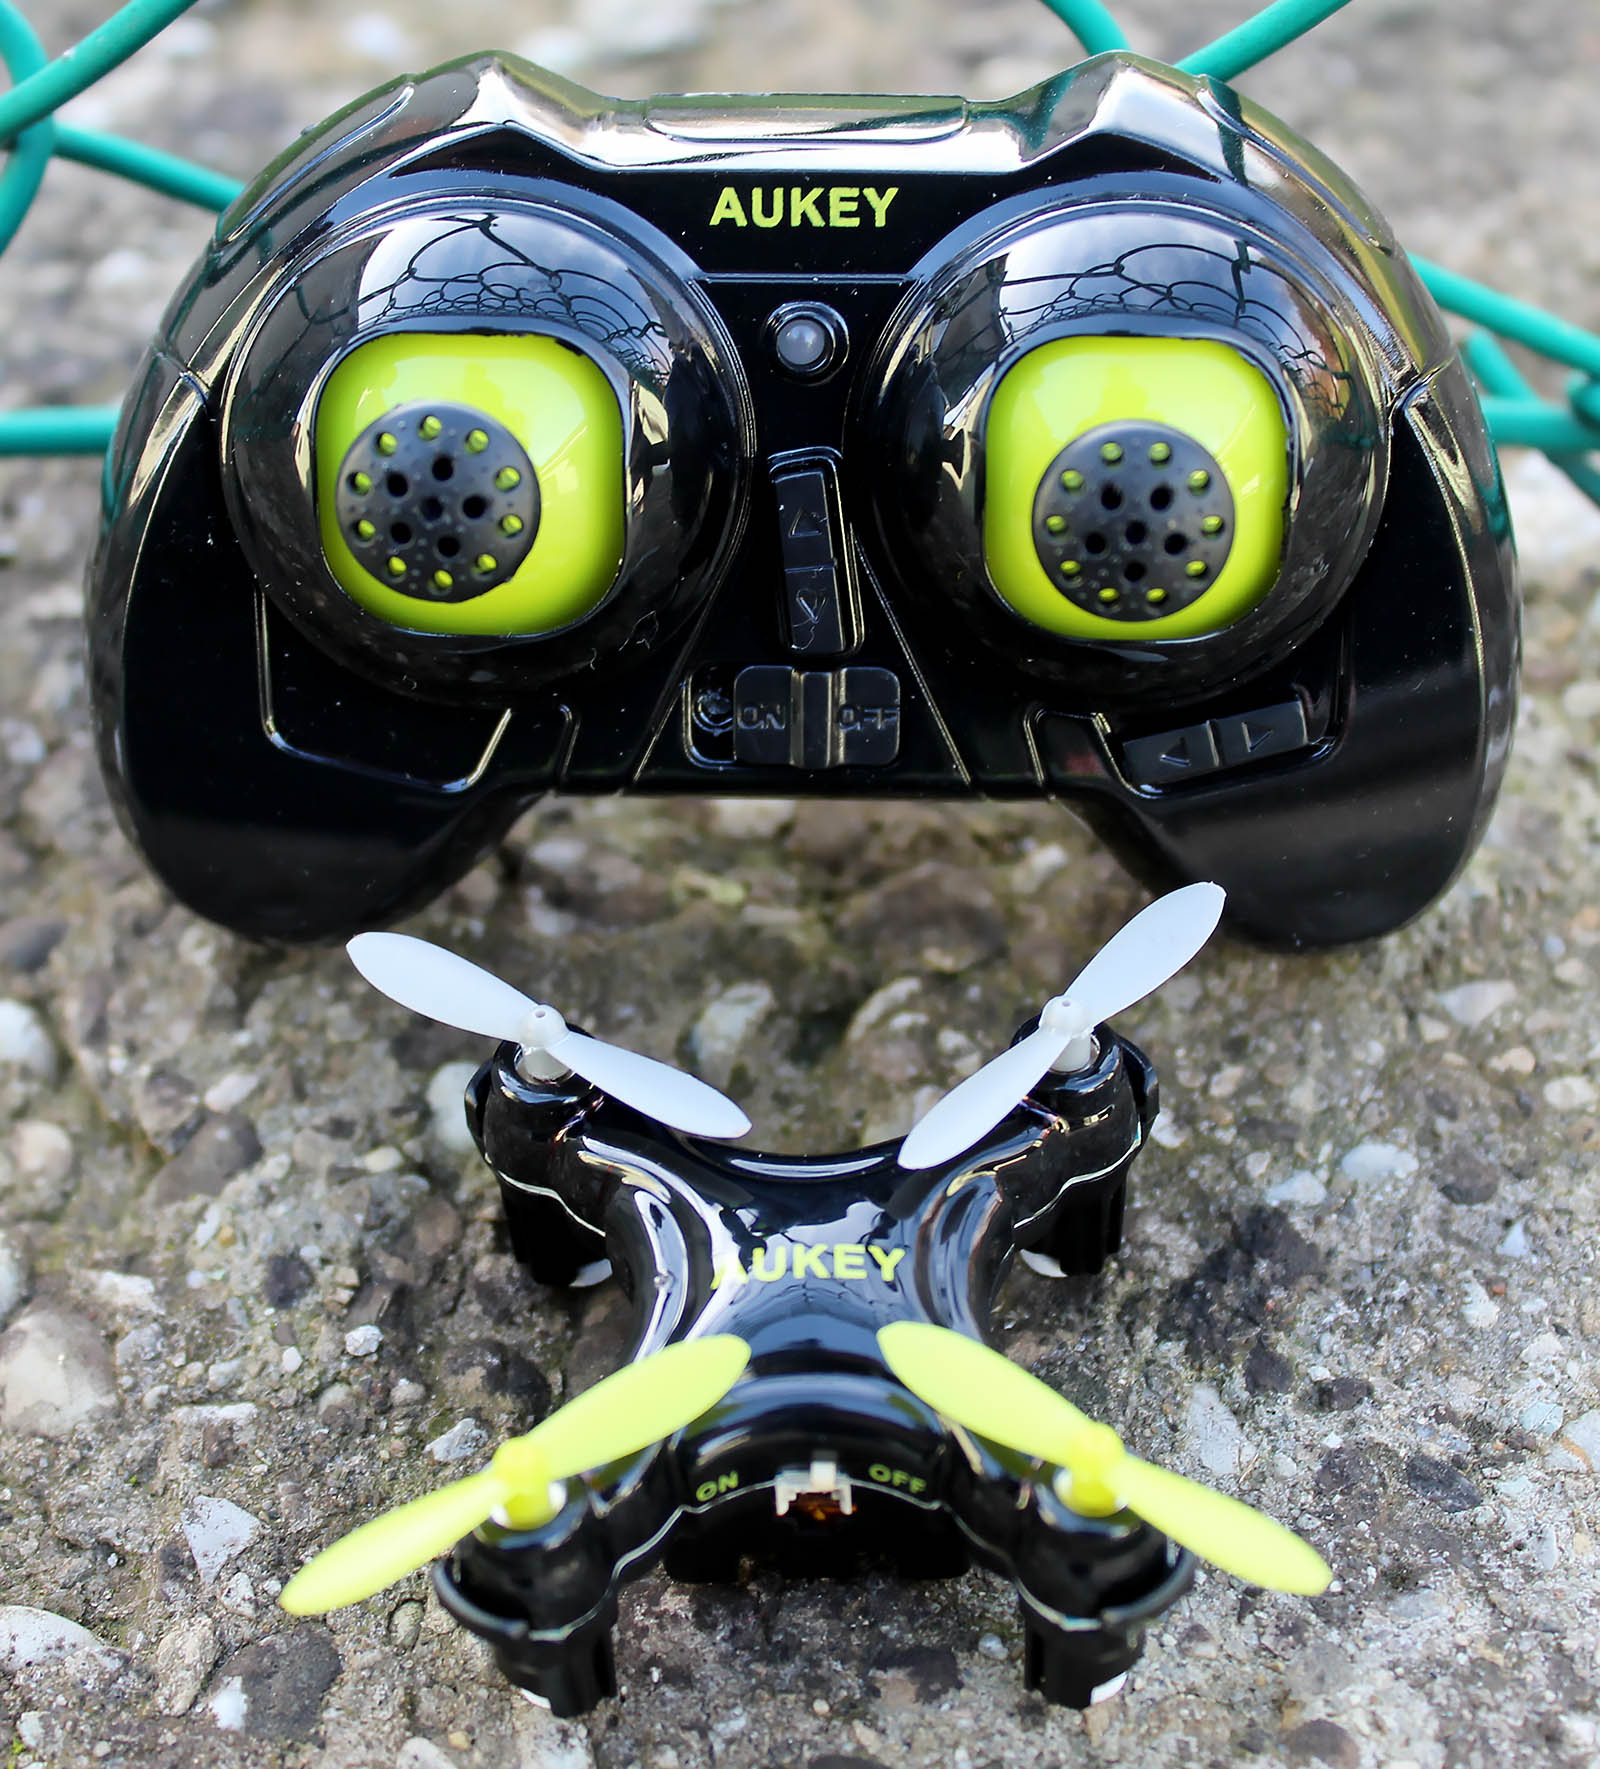 Mini drone Aukey UA-P01